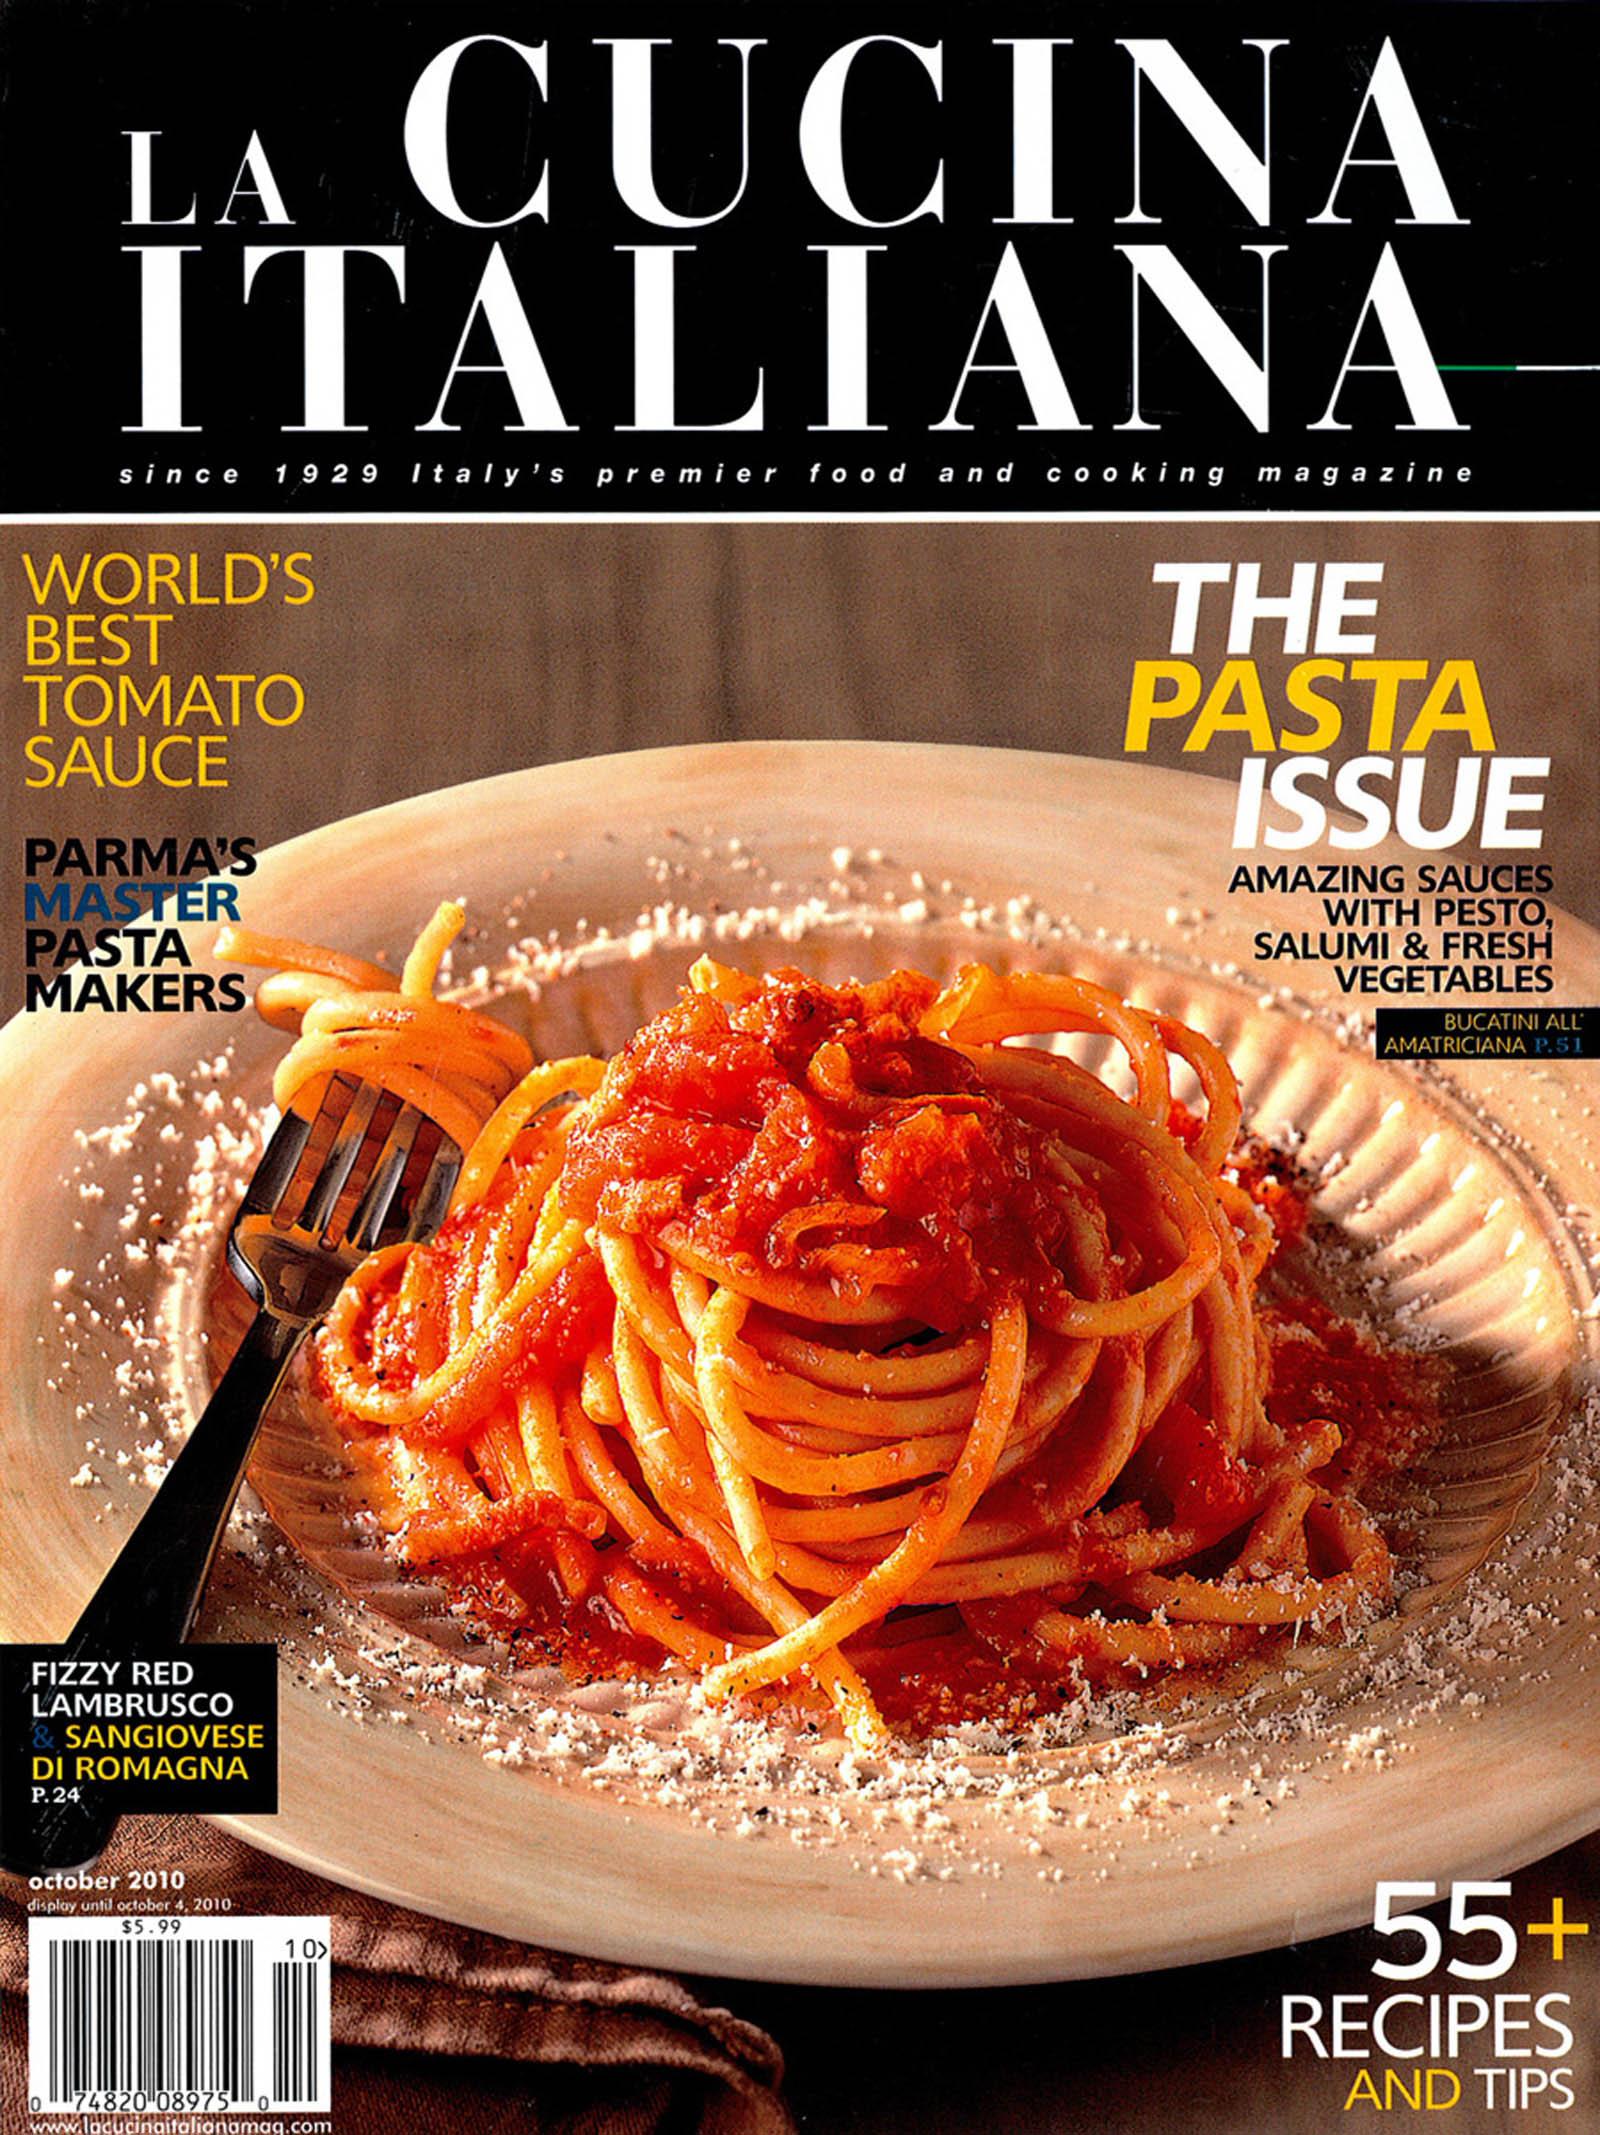 La cucina italiana wiki for La cucina italiana